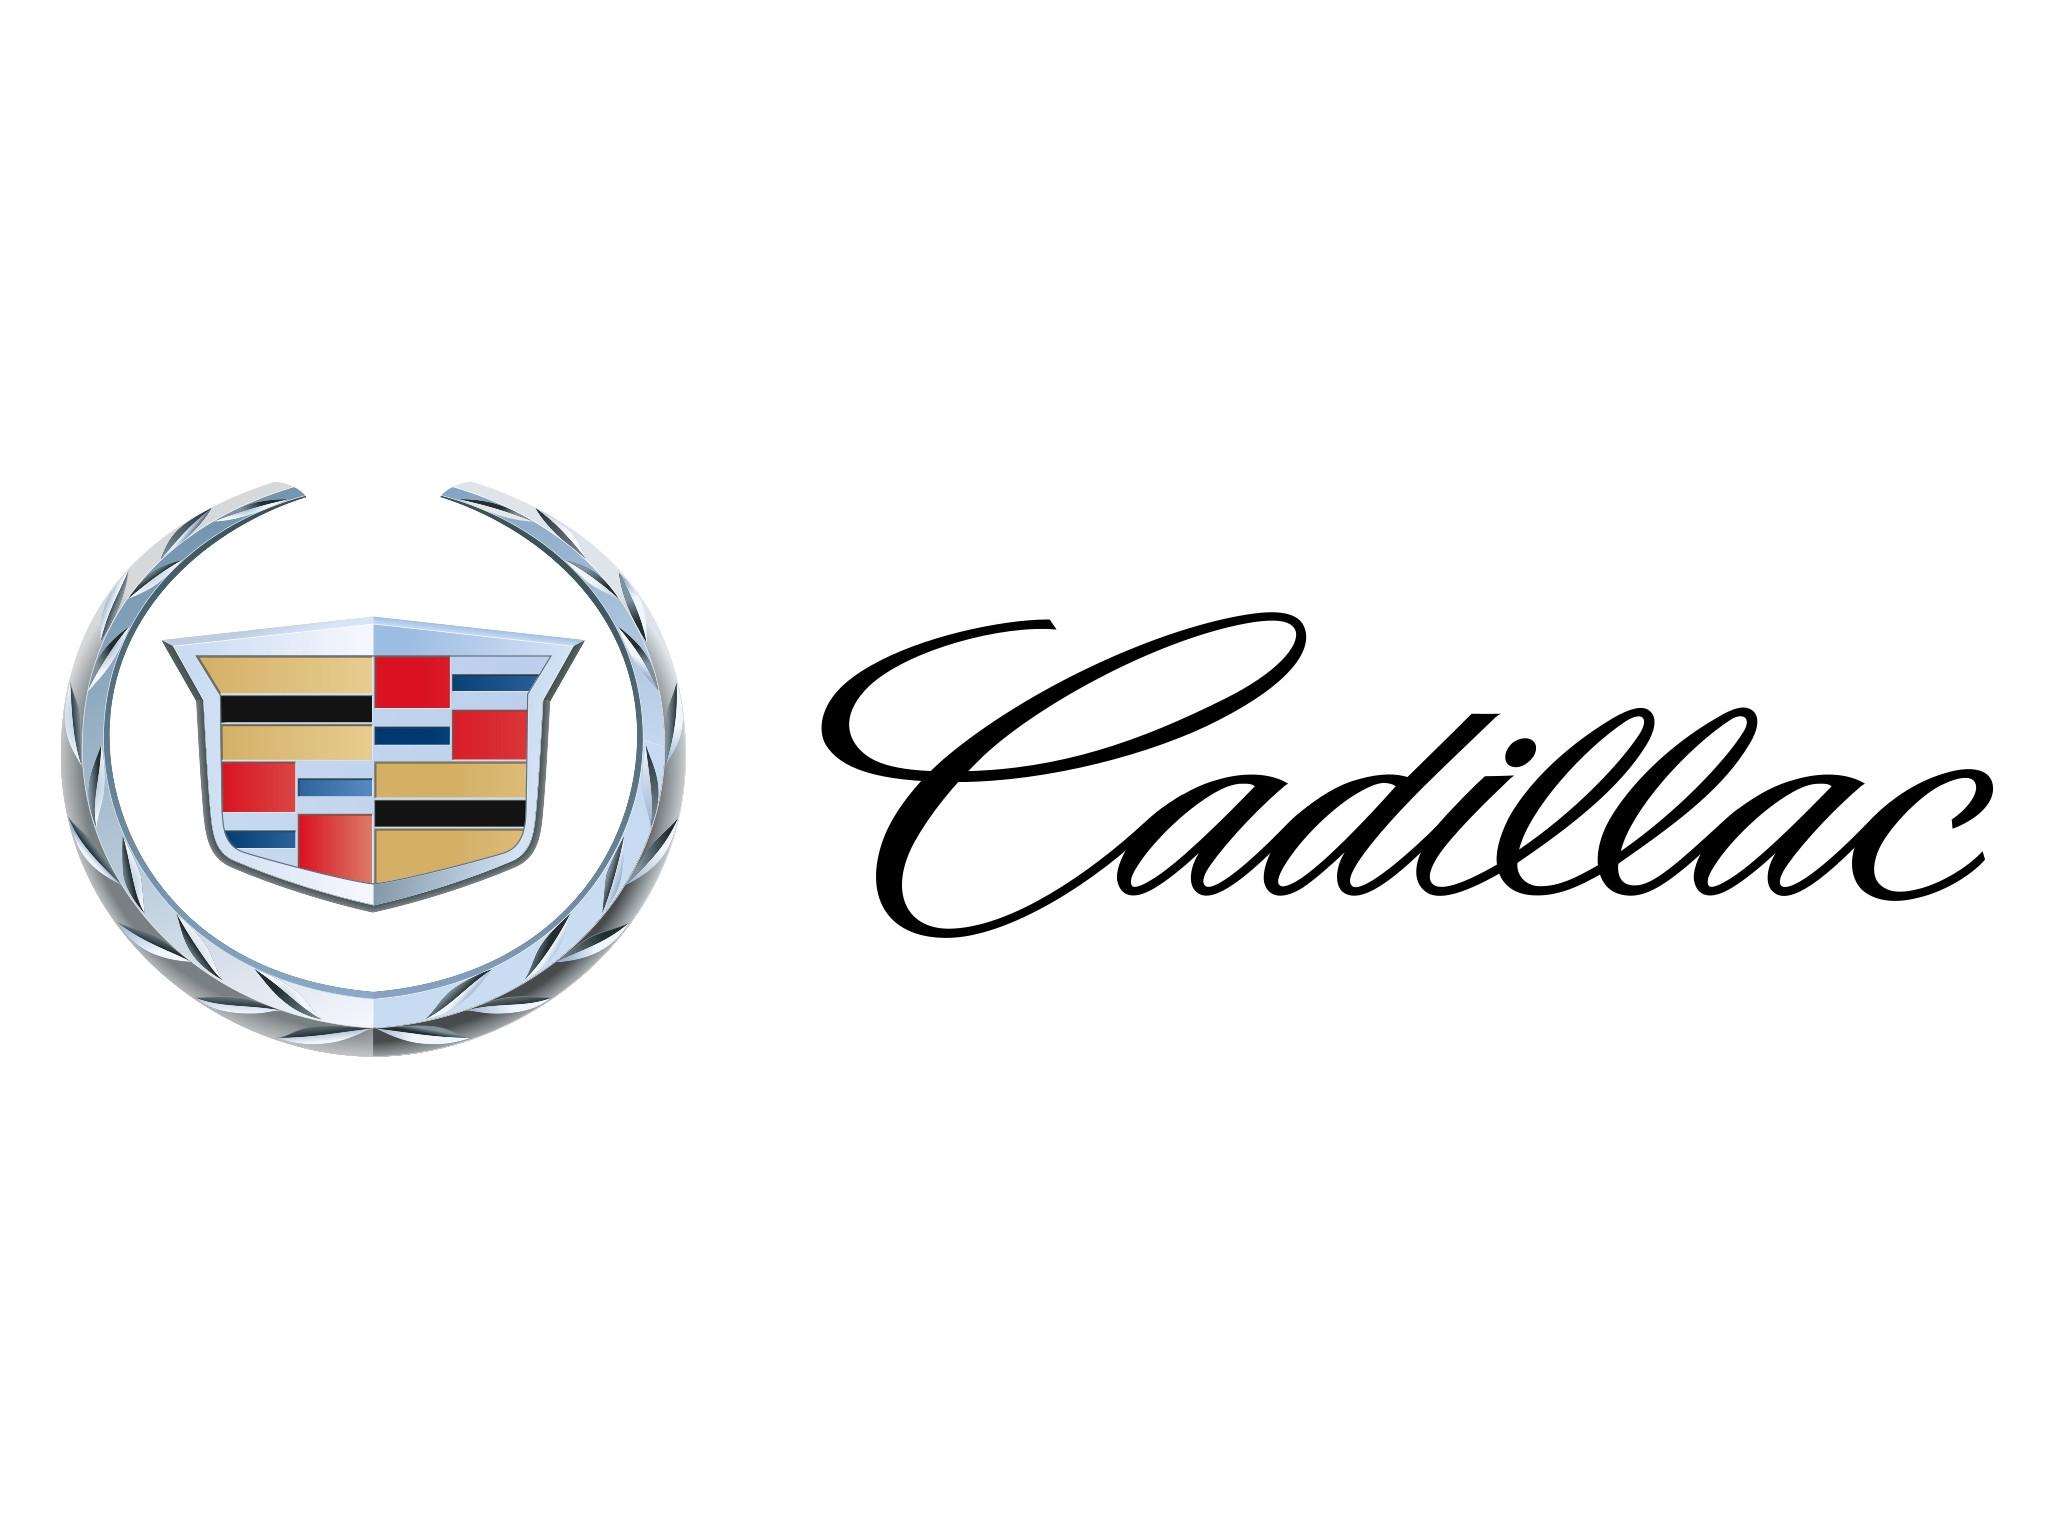 cadillac v logo vector. 2048x1536 cadillac logo vector v r